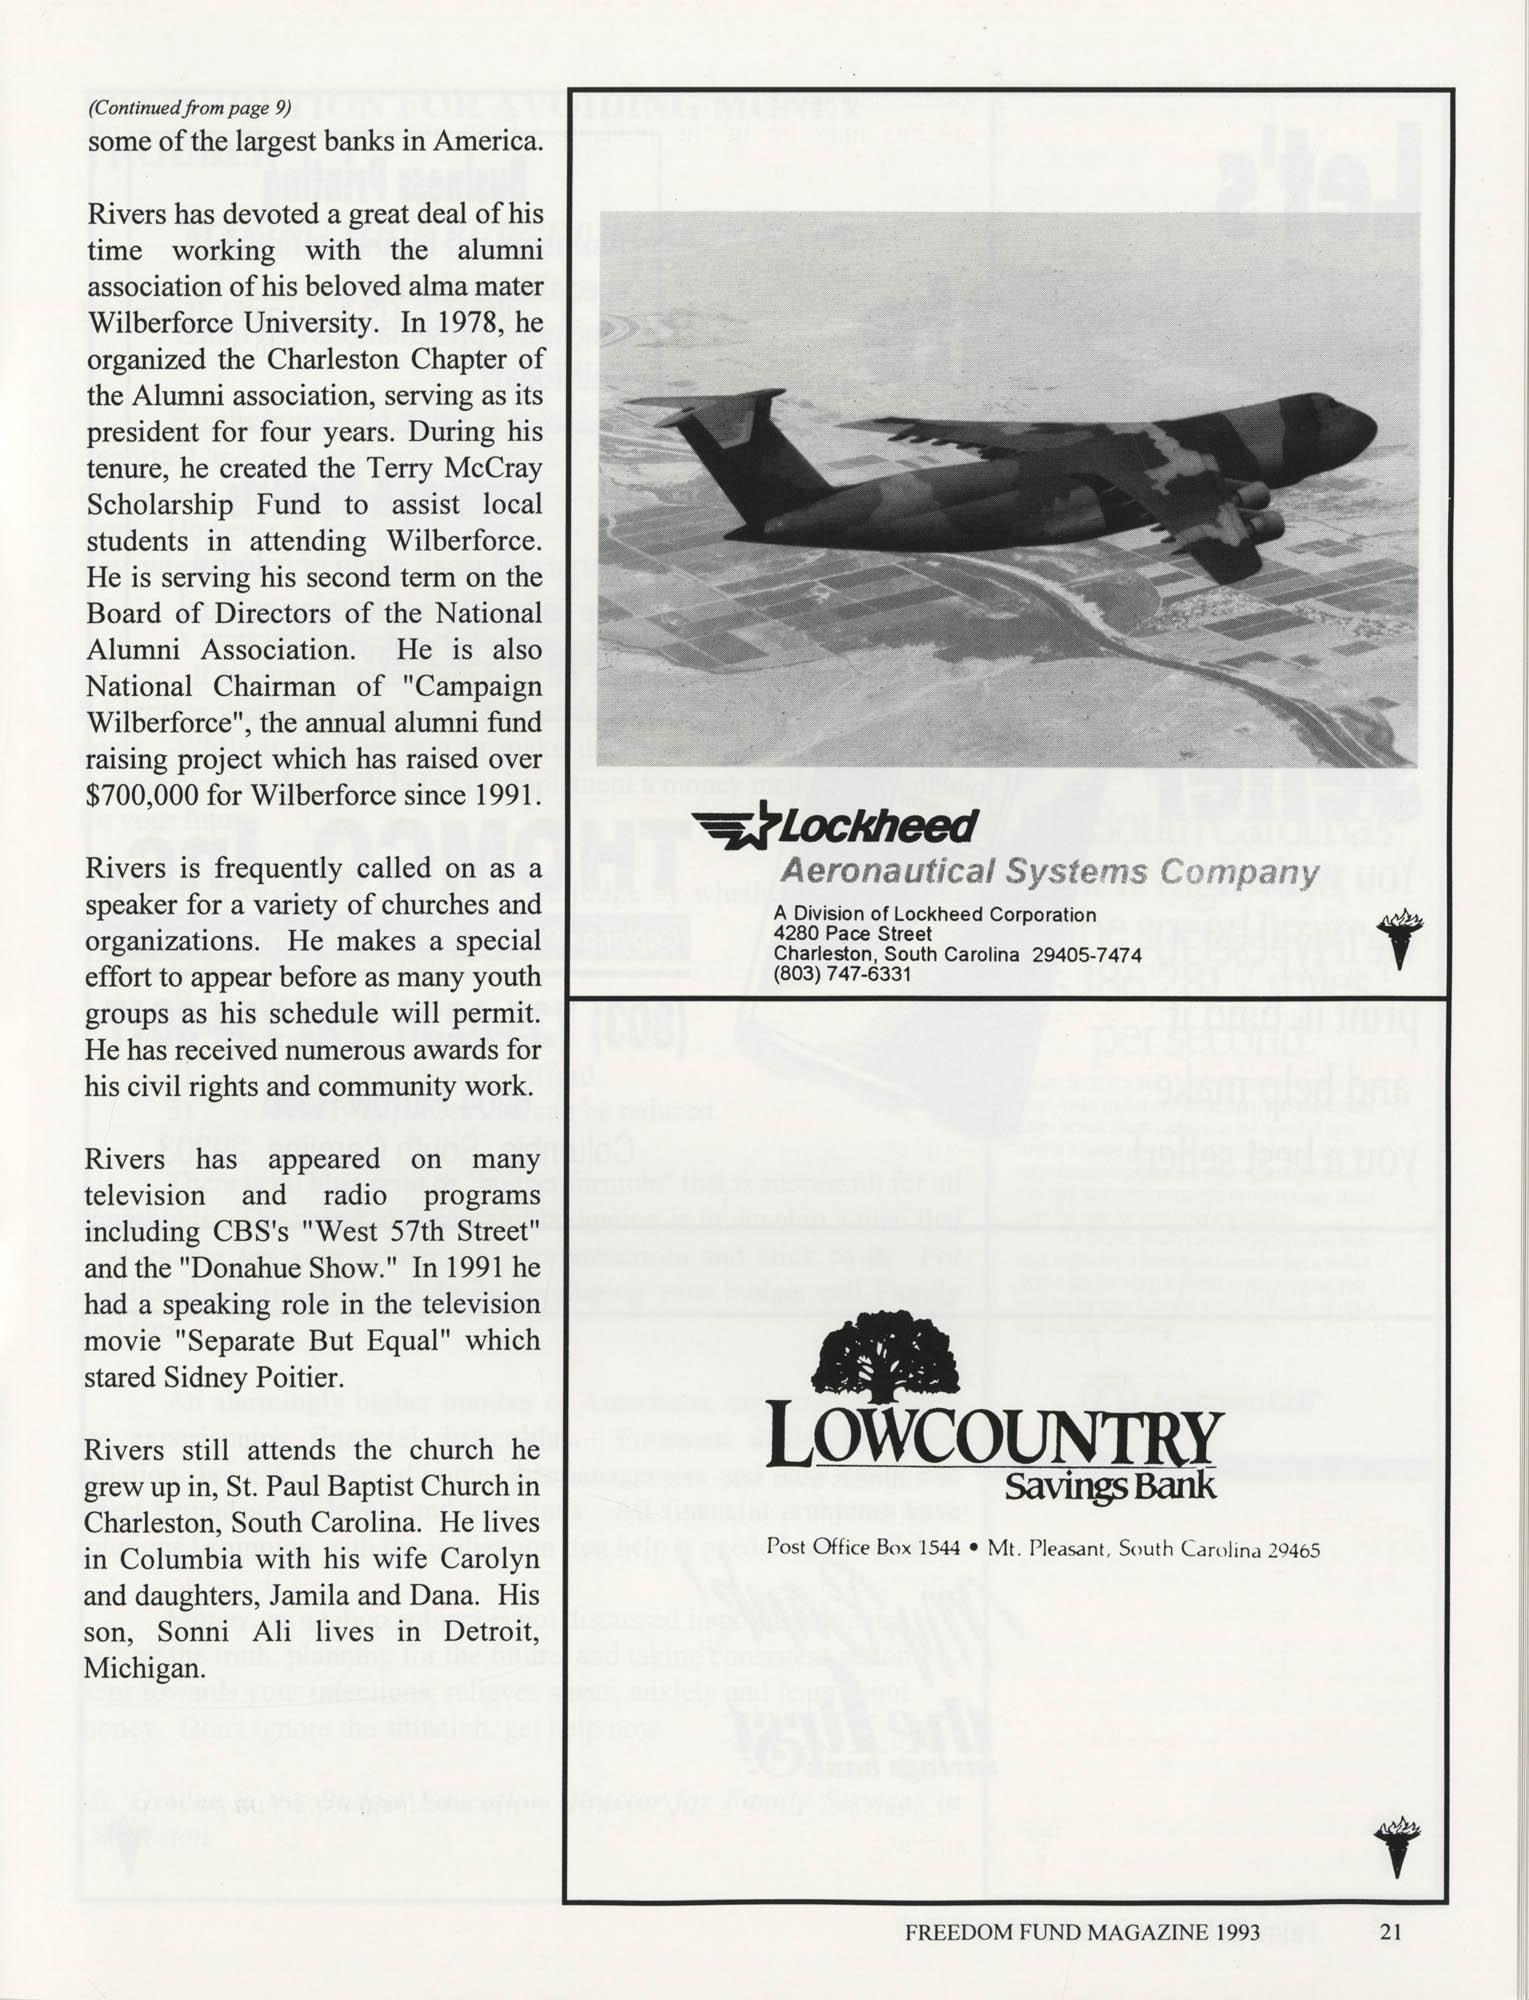 Freedom Fund Magazine, 1993, Page 21